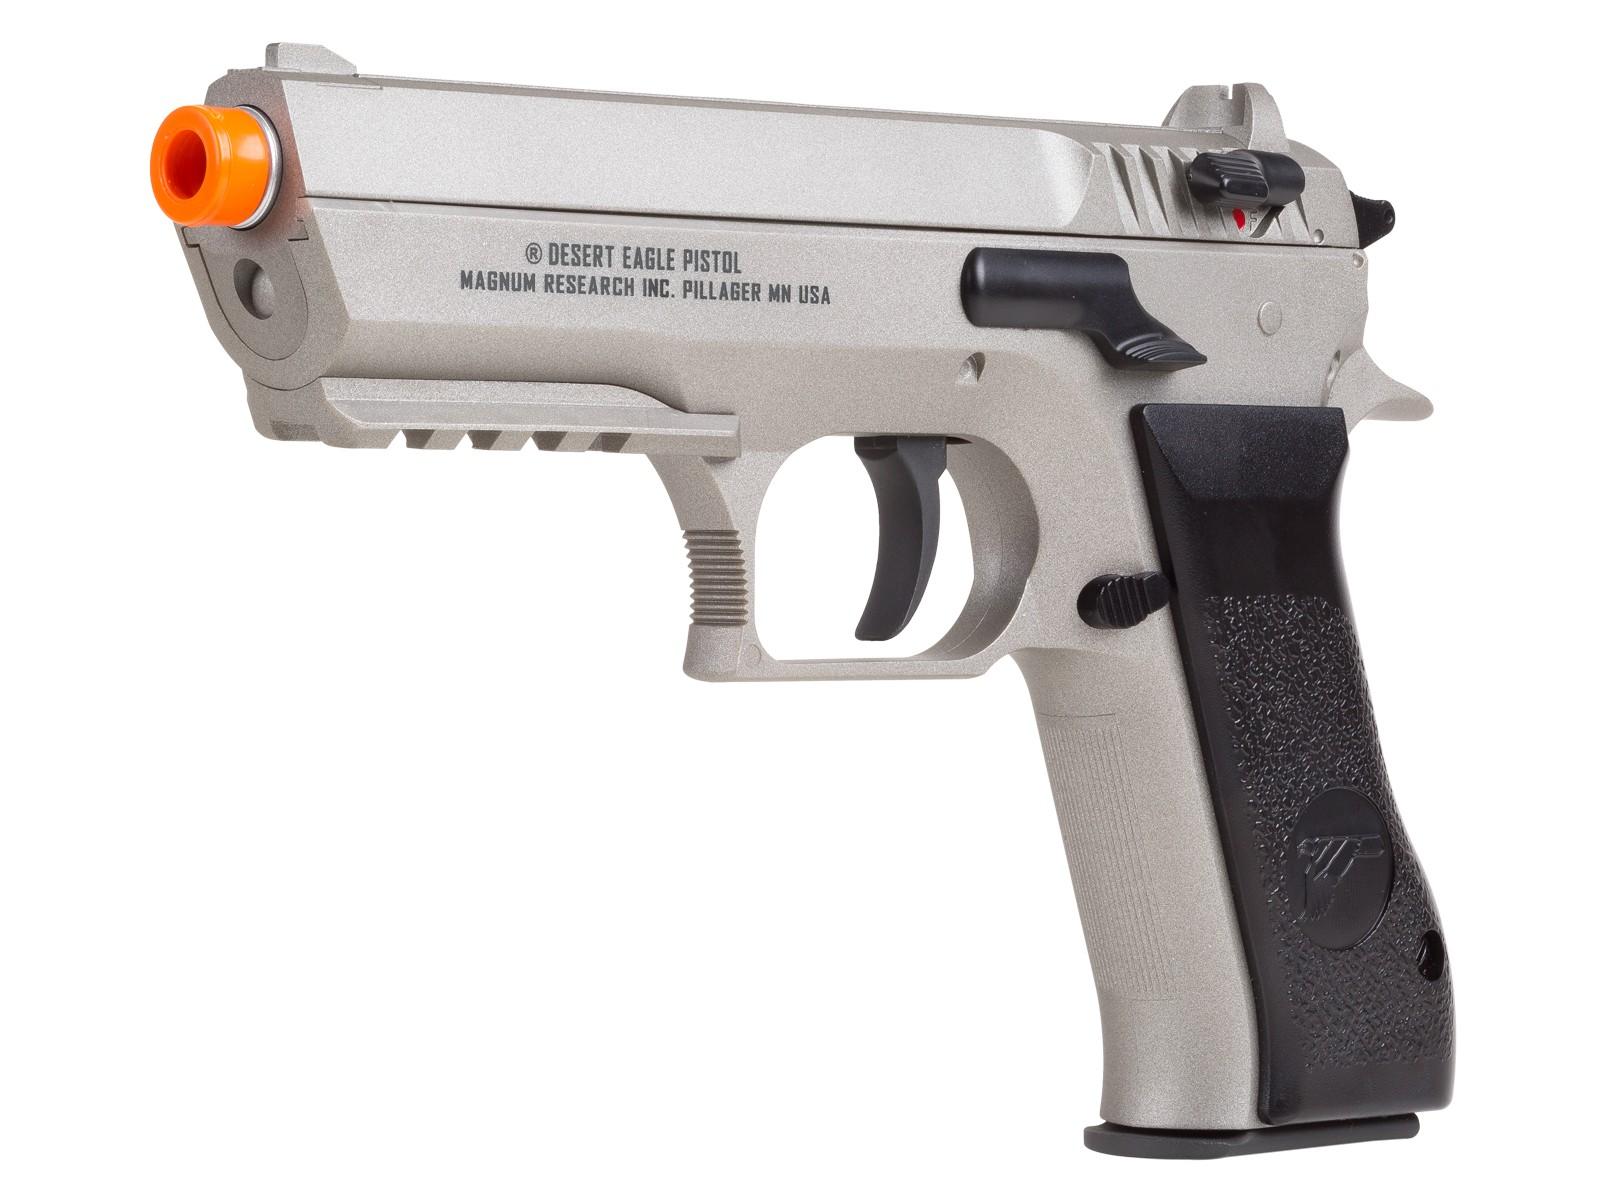 Cybergun Baby Desert Eagle Nbb Co2 Airsoft Pistol